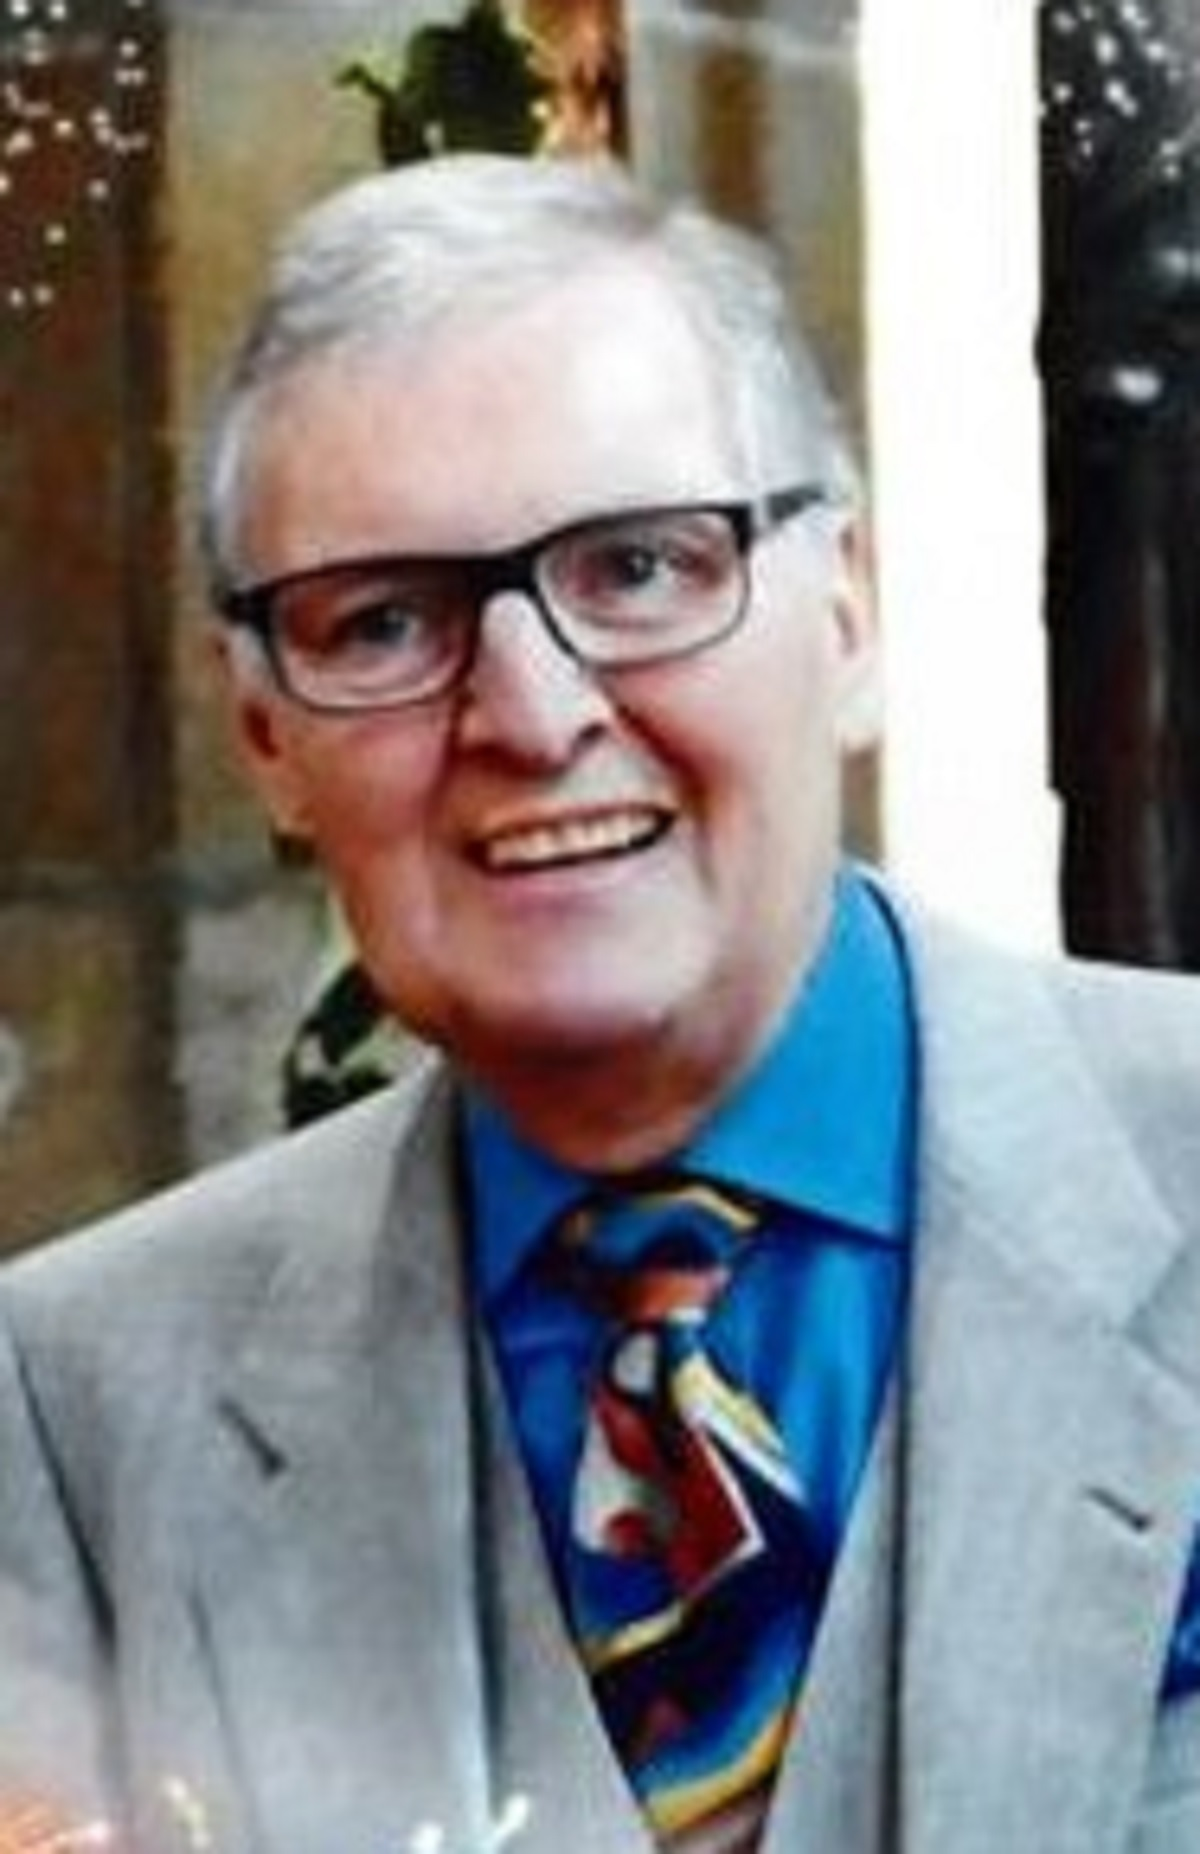 Craven bids farewell to honorary Yorkshireman Derek Green